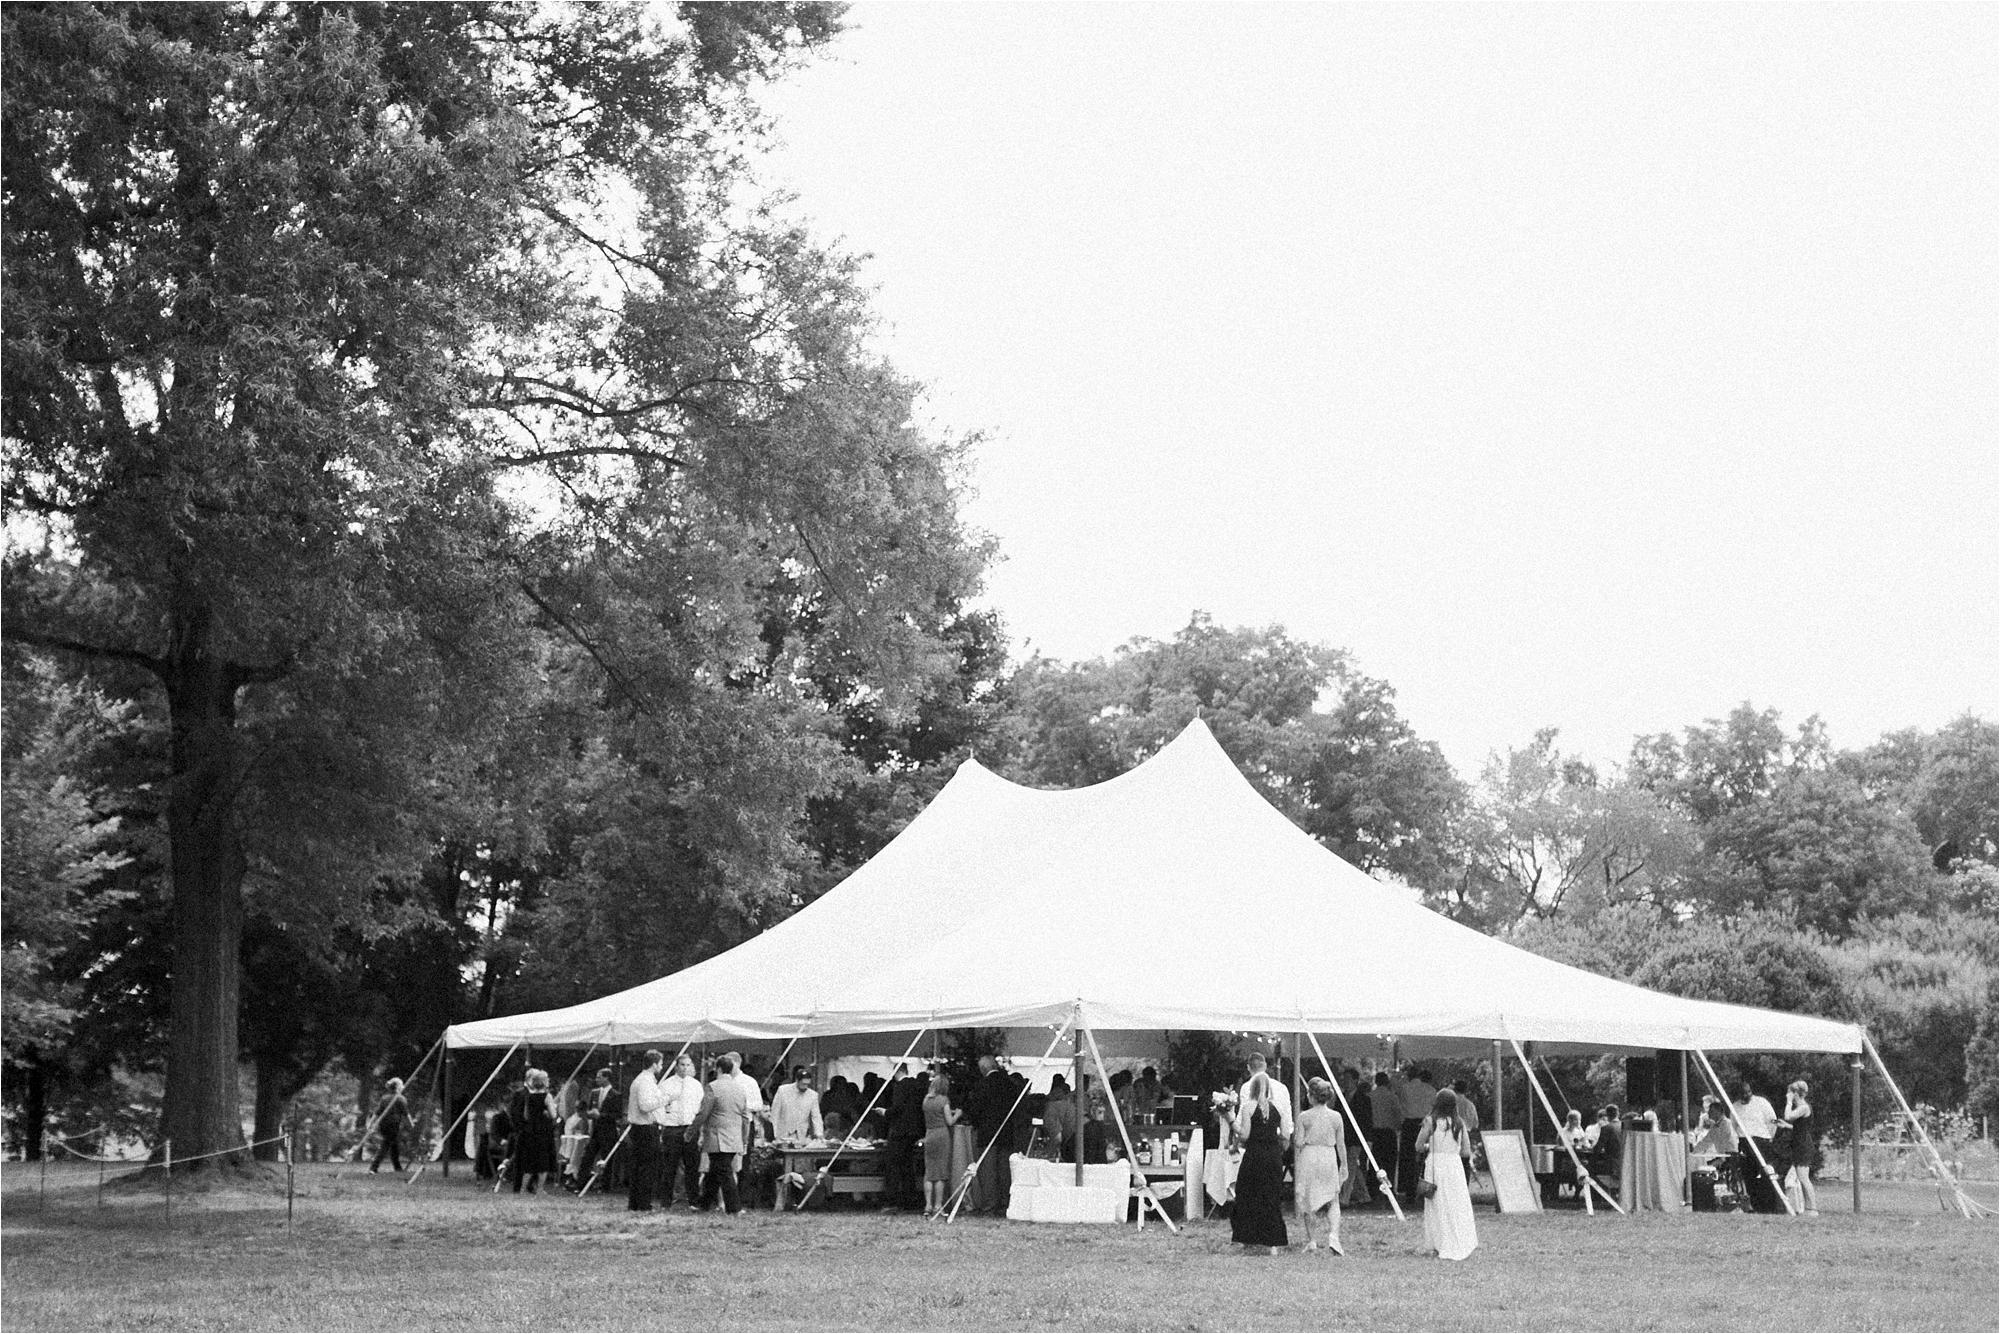 richmond-virginia-tuckahoe-plantation-coral-summer-wedding-stephanie-yonce-photos_0055.jpg